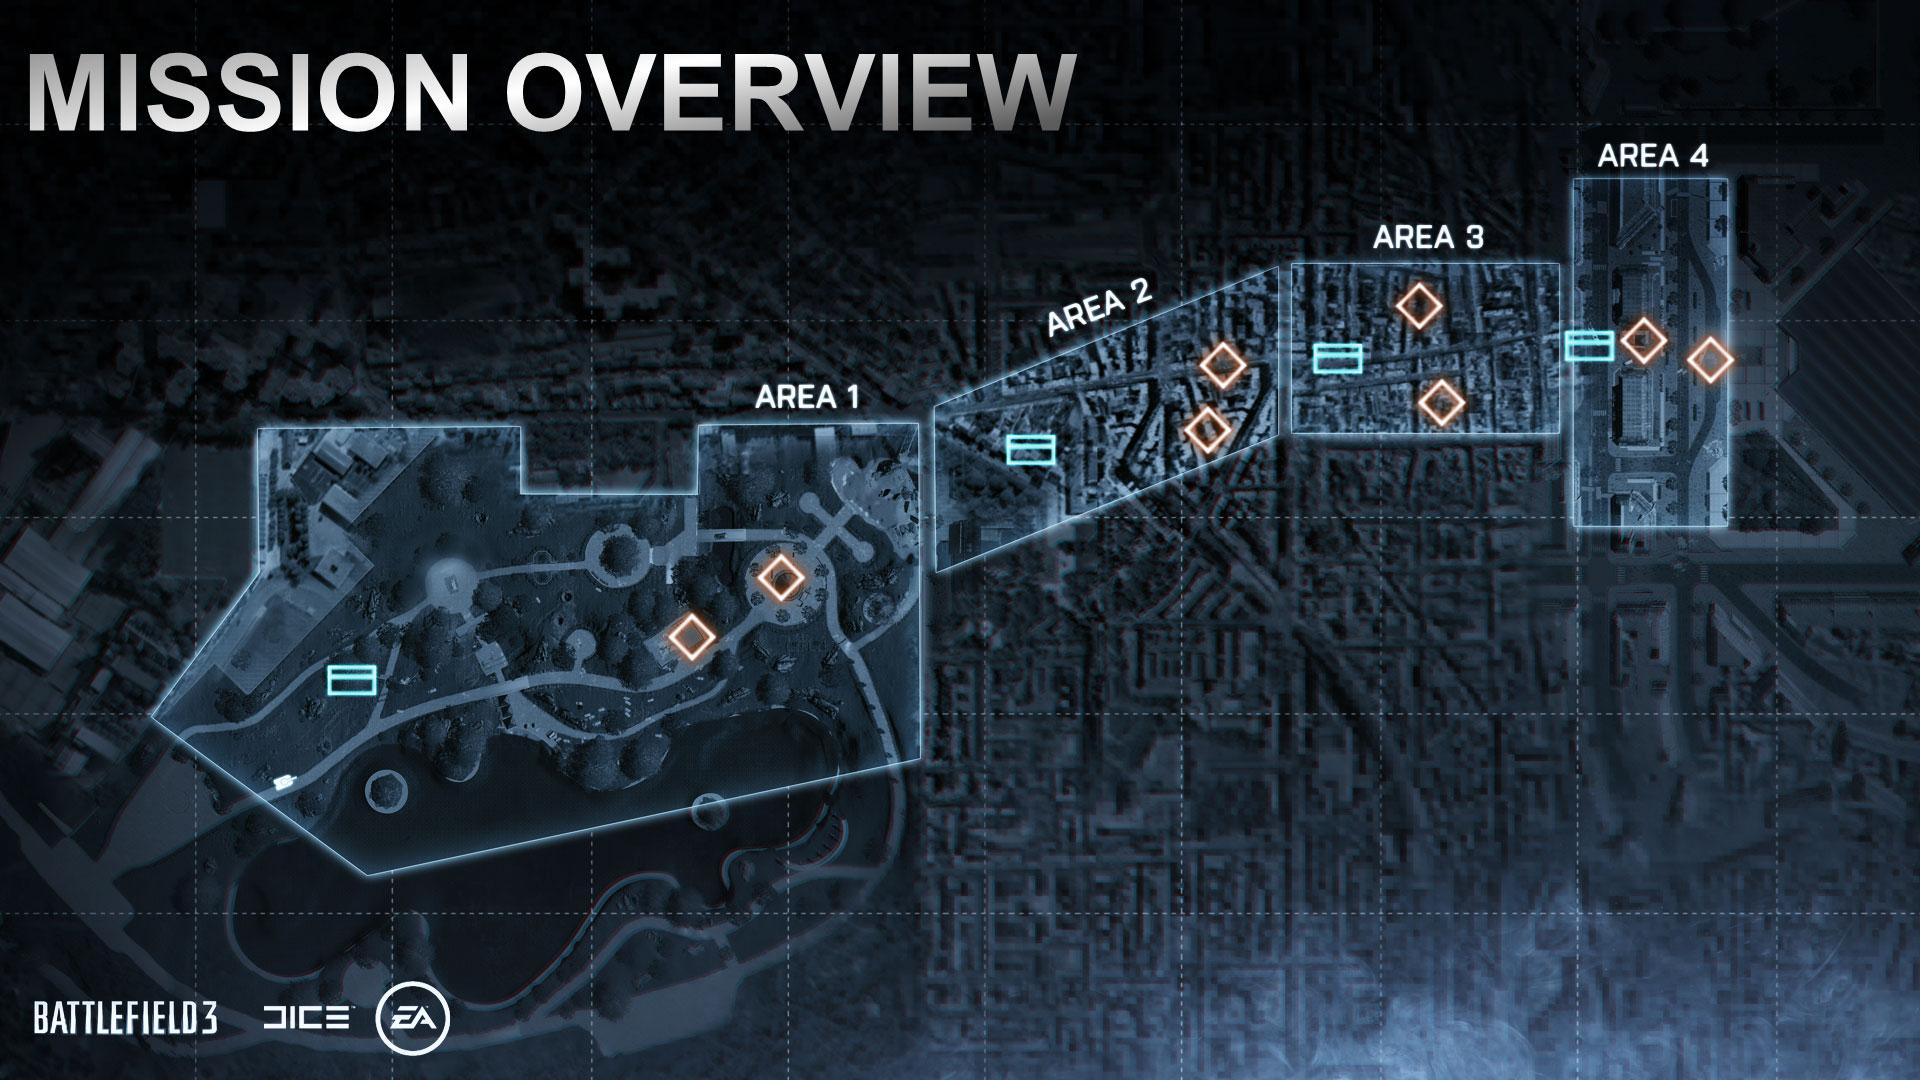 battlefield 3 pc game free download full version kickass